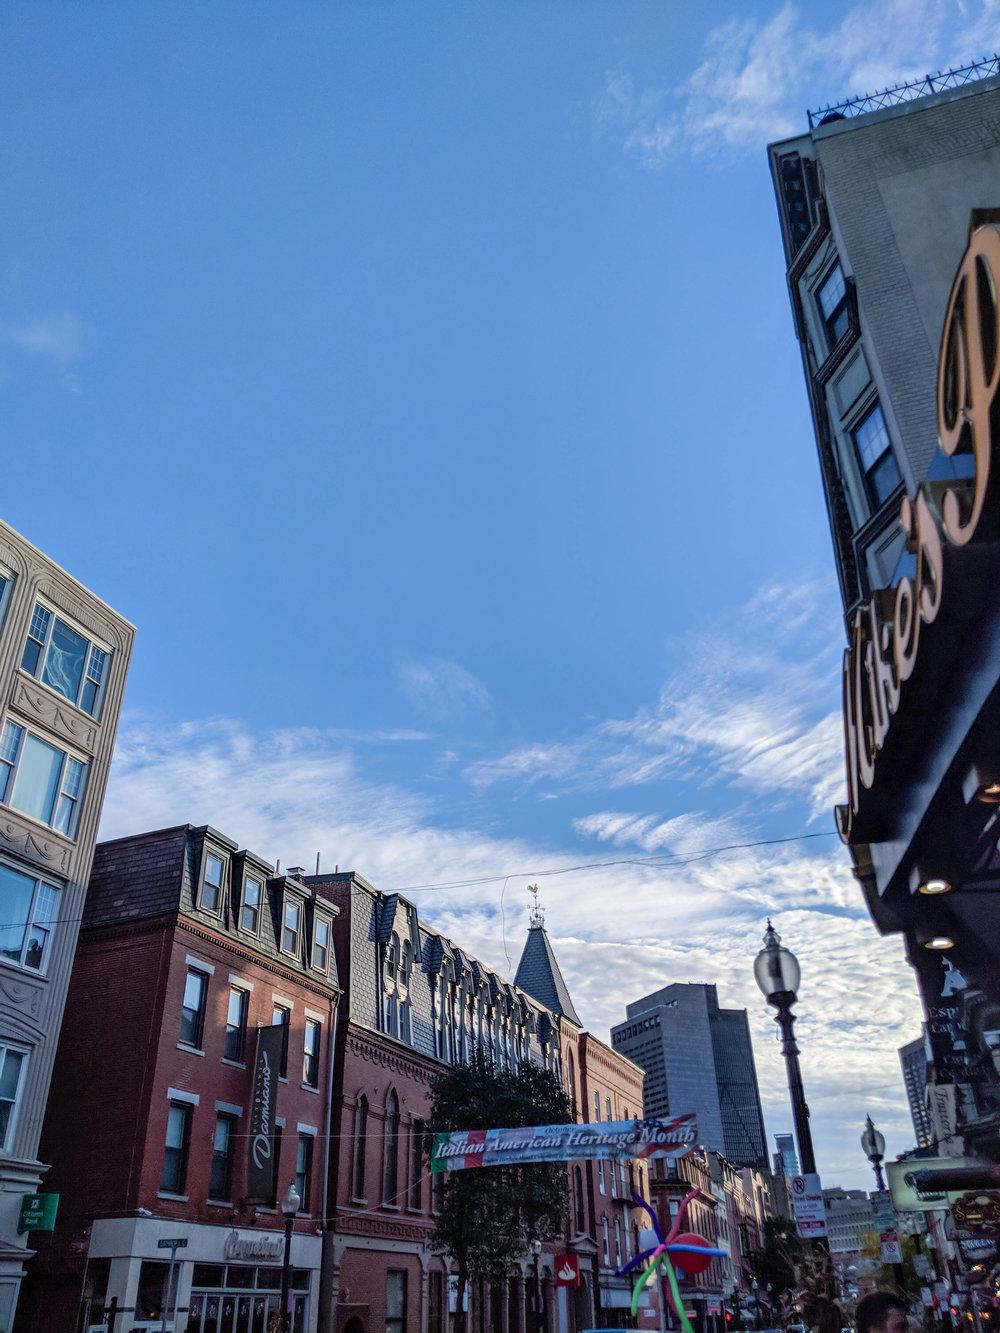 bri rinehart; photography; mike's pastry; north end; boston; food